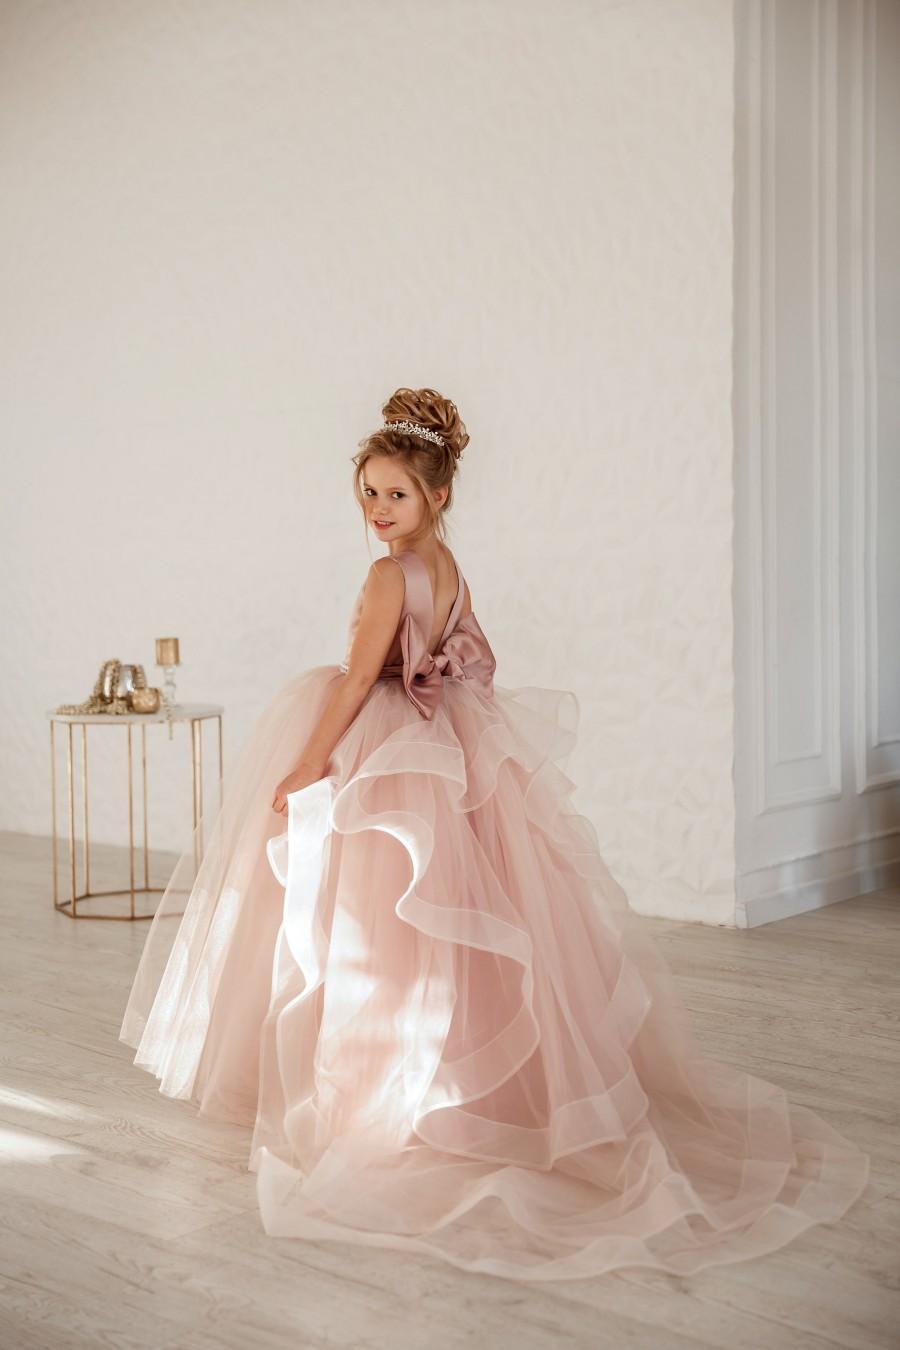 Wedding - Girl wedding dress  Blush flower girl dress  Princess dress Dusty rose flower girl dress Satin flower girl dress Toddler dresses